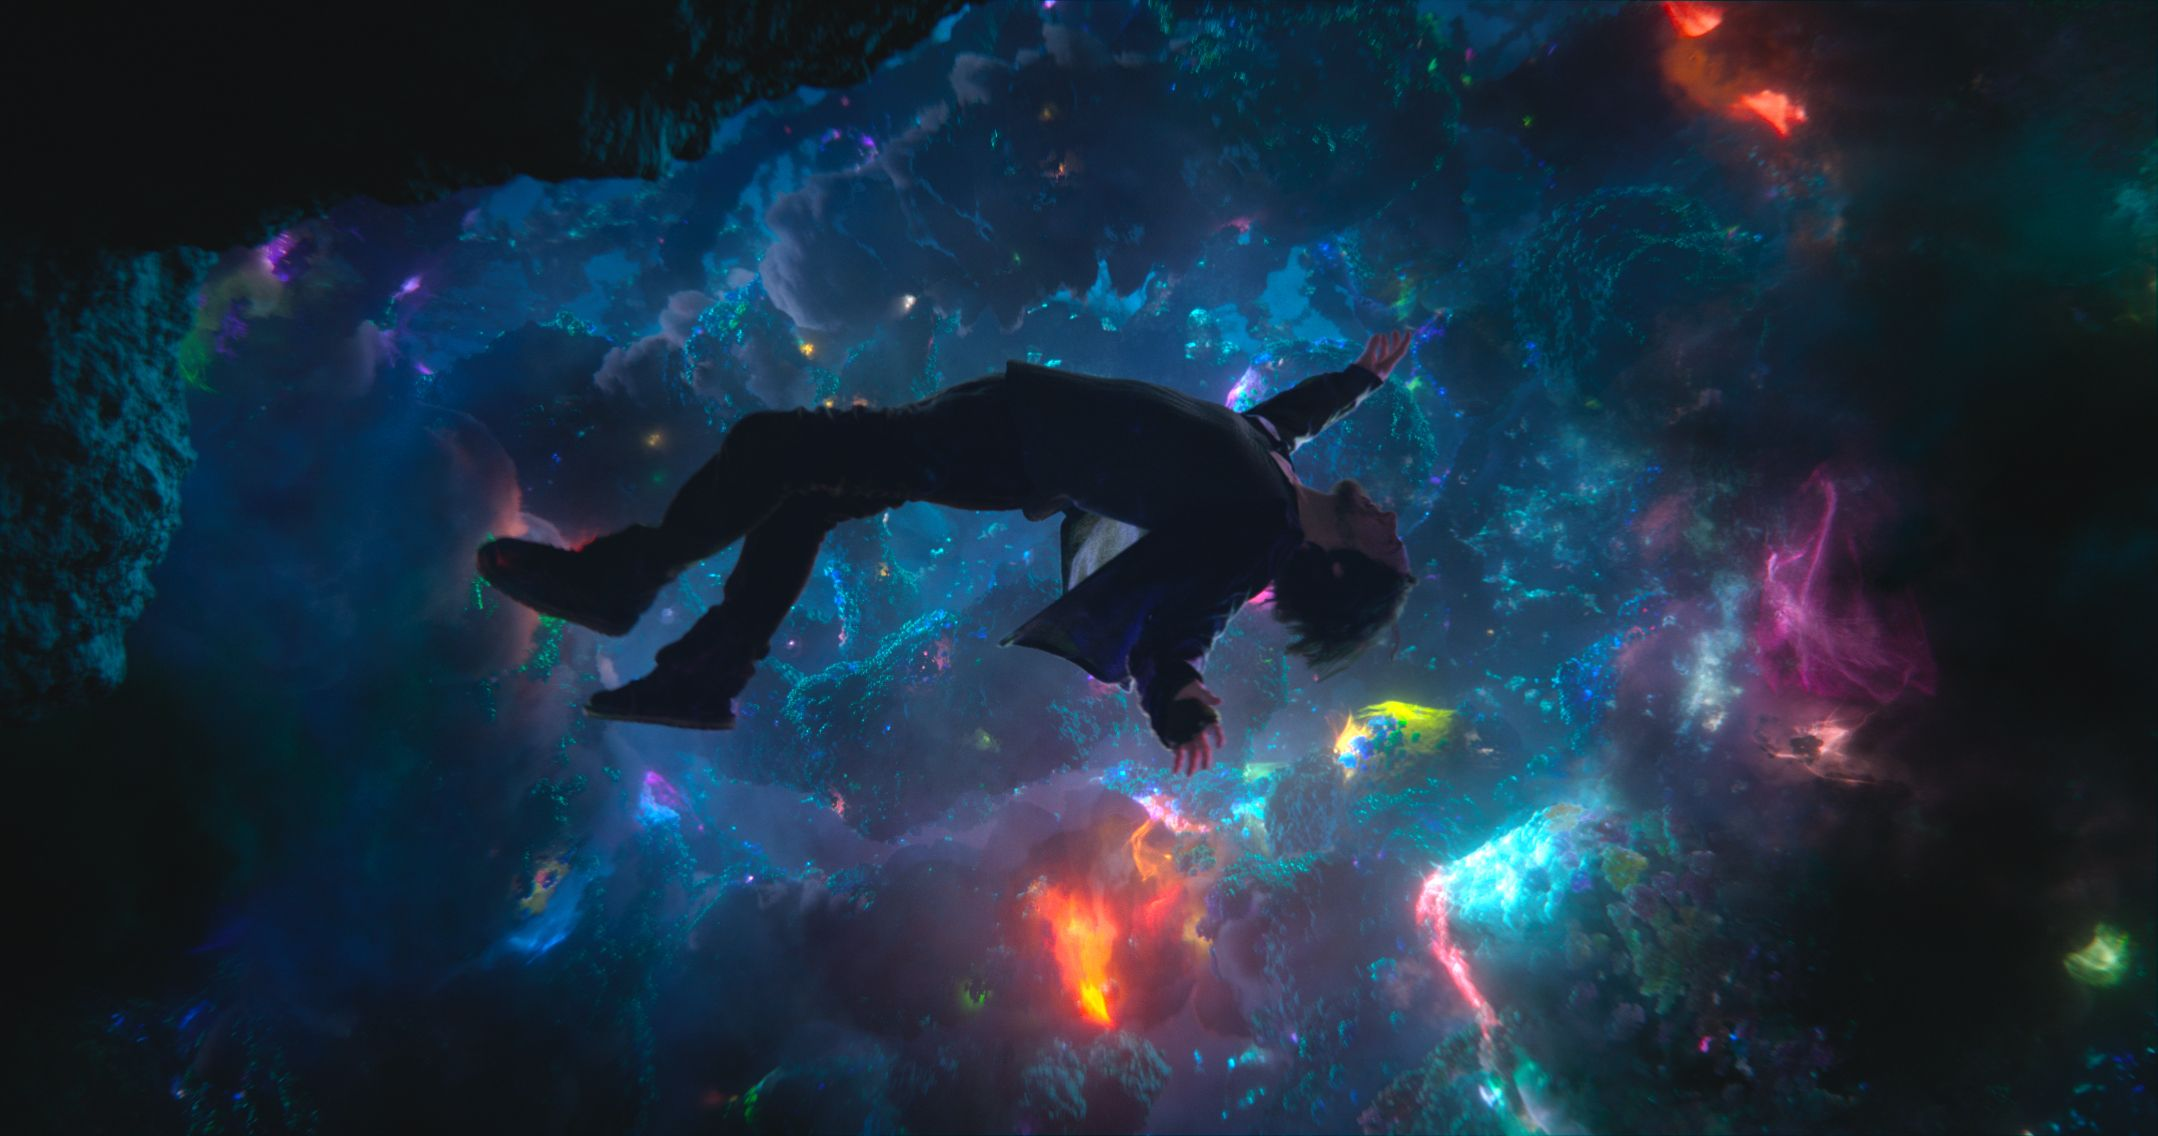 23 Best Marvel Movies - Dr Strange